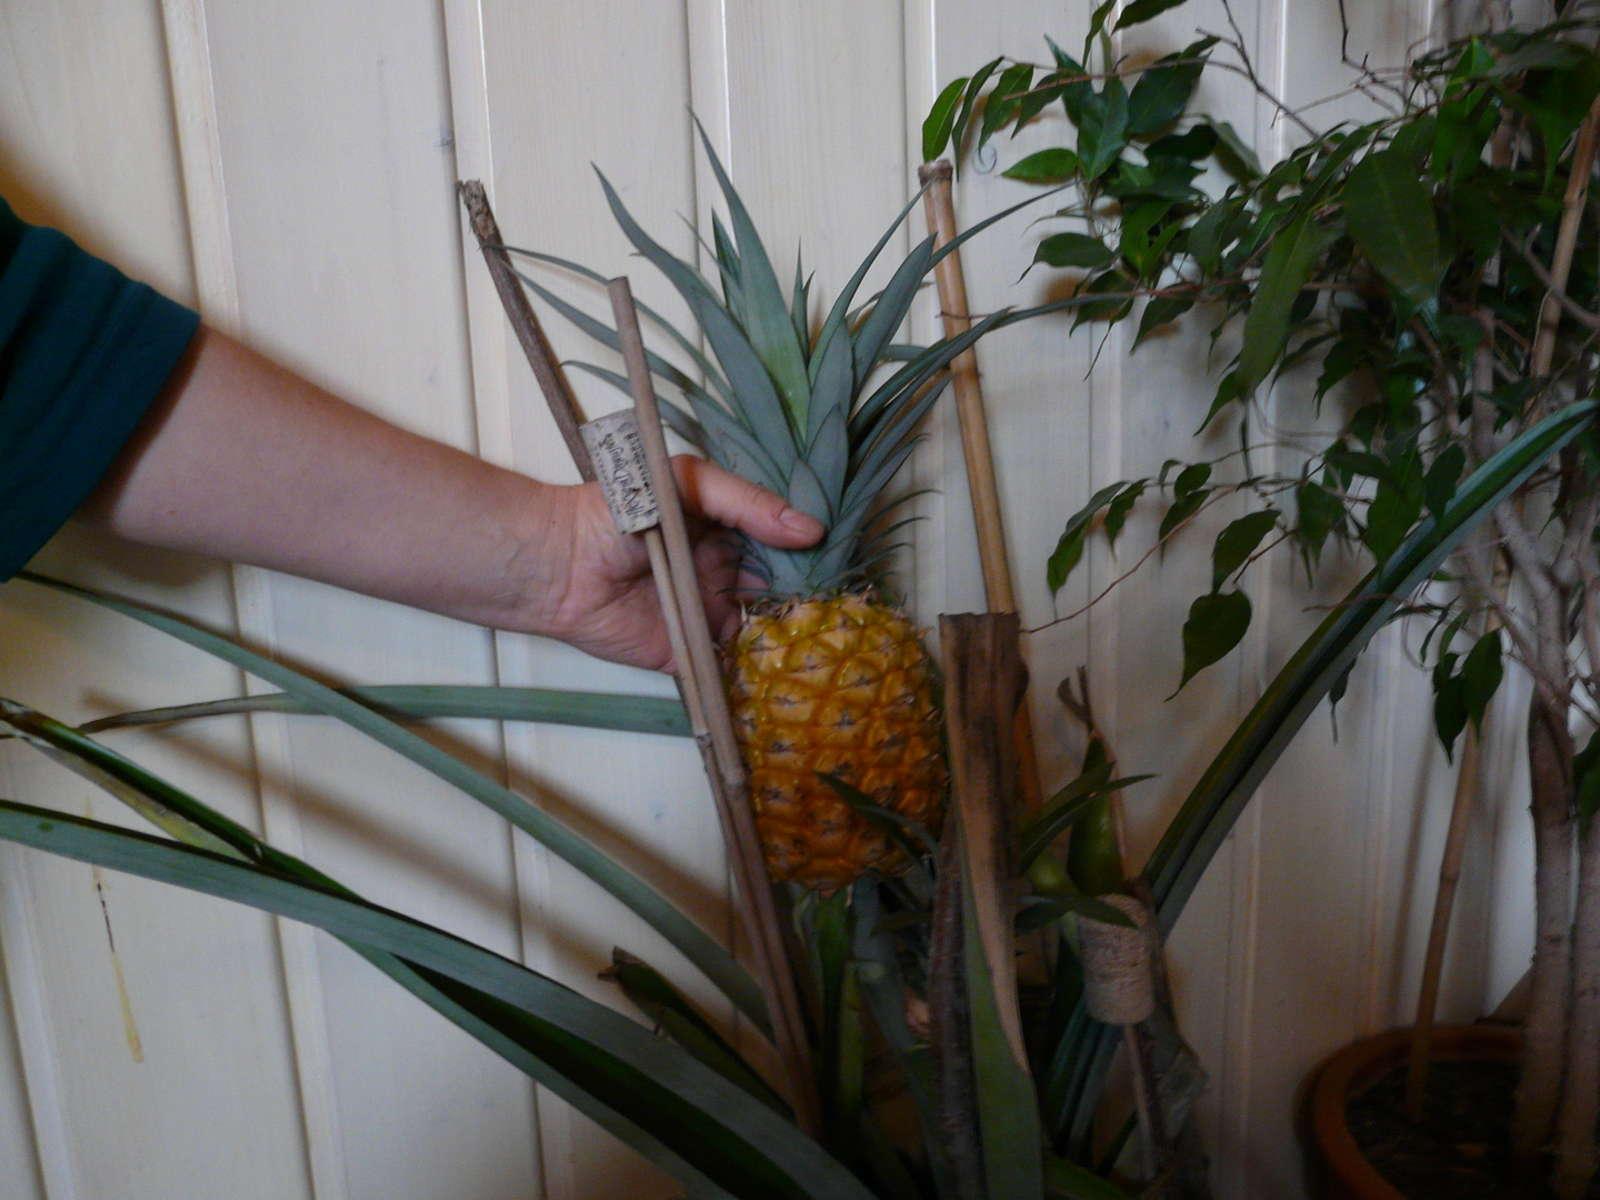 Ananas Anpflanzen Vermehrung Anbau Anleitung Plantura